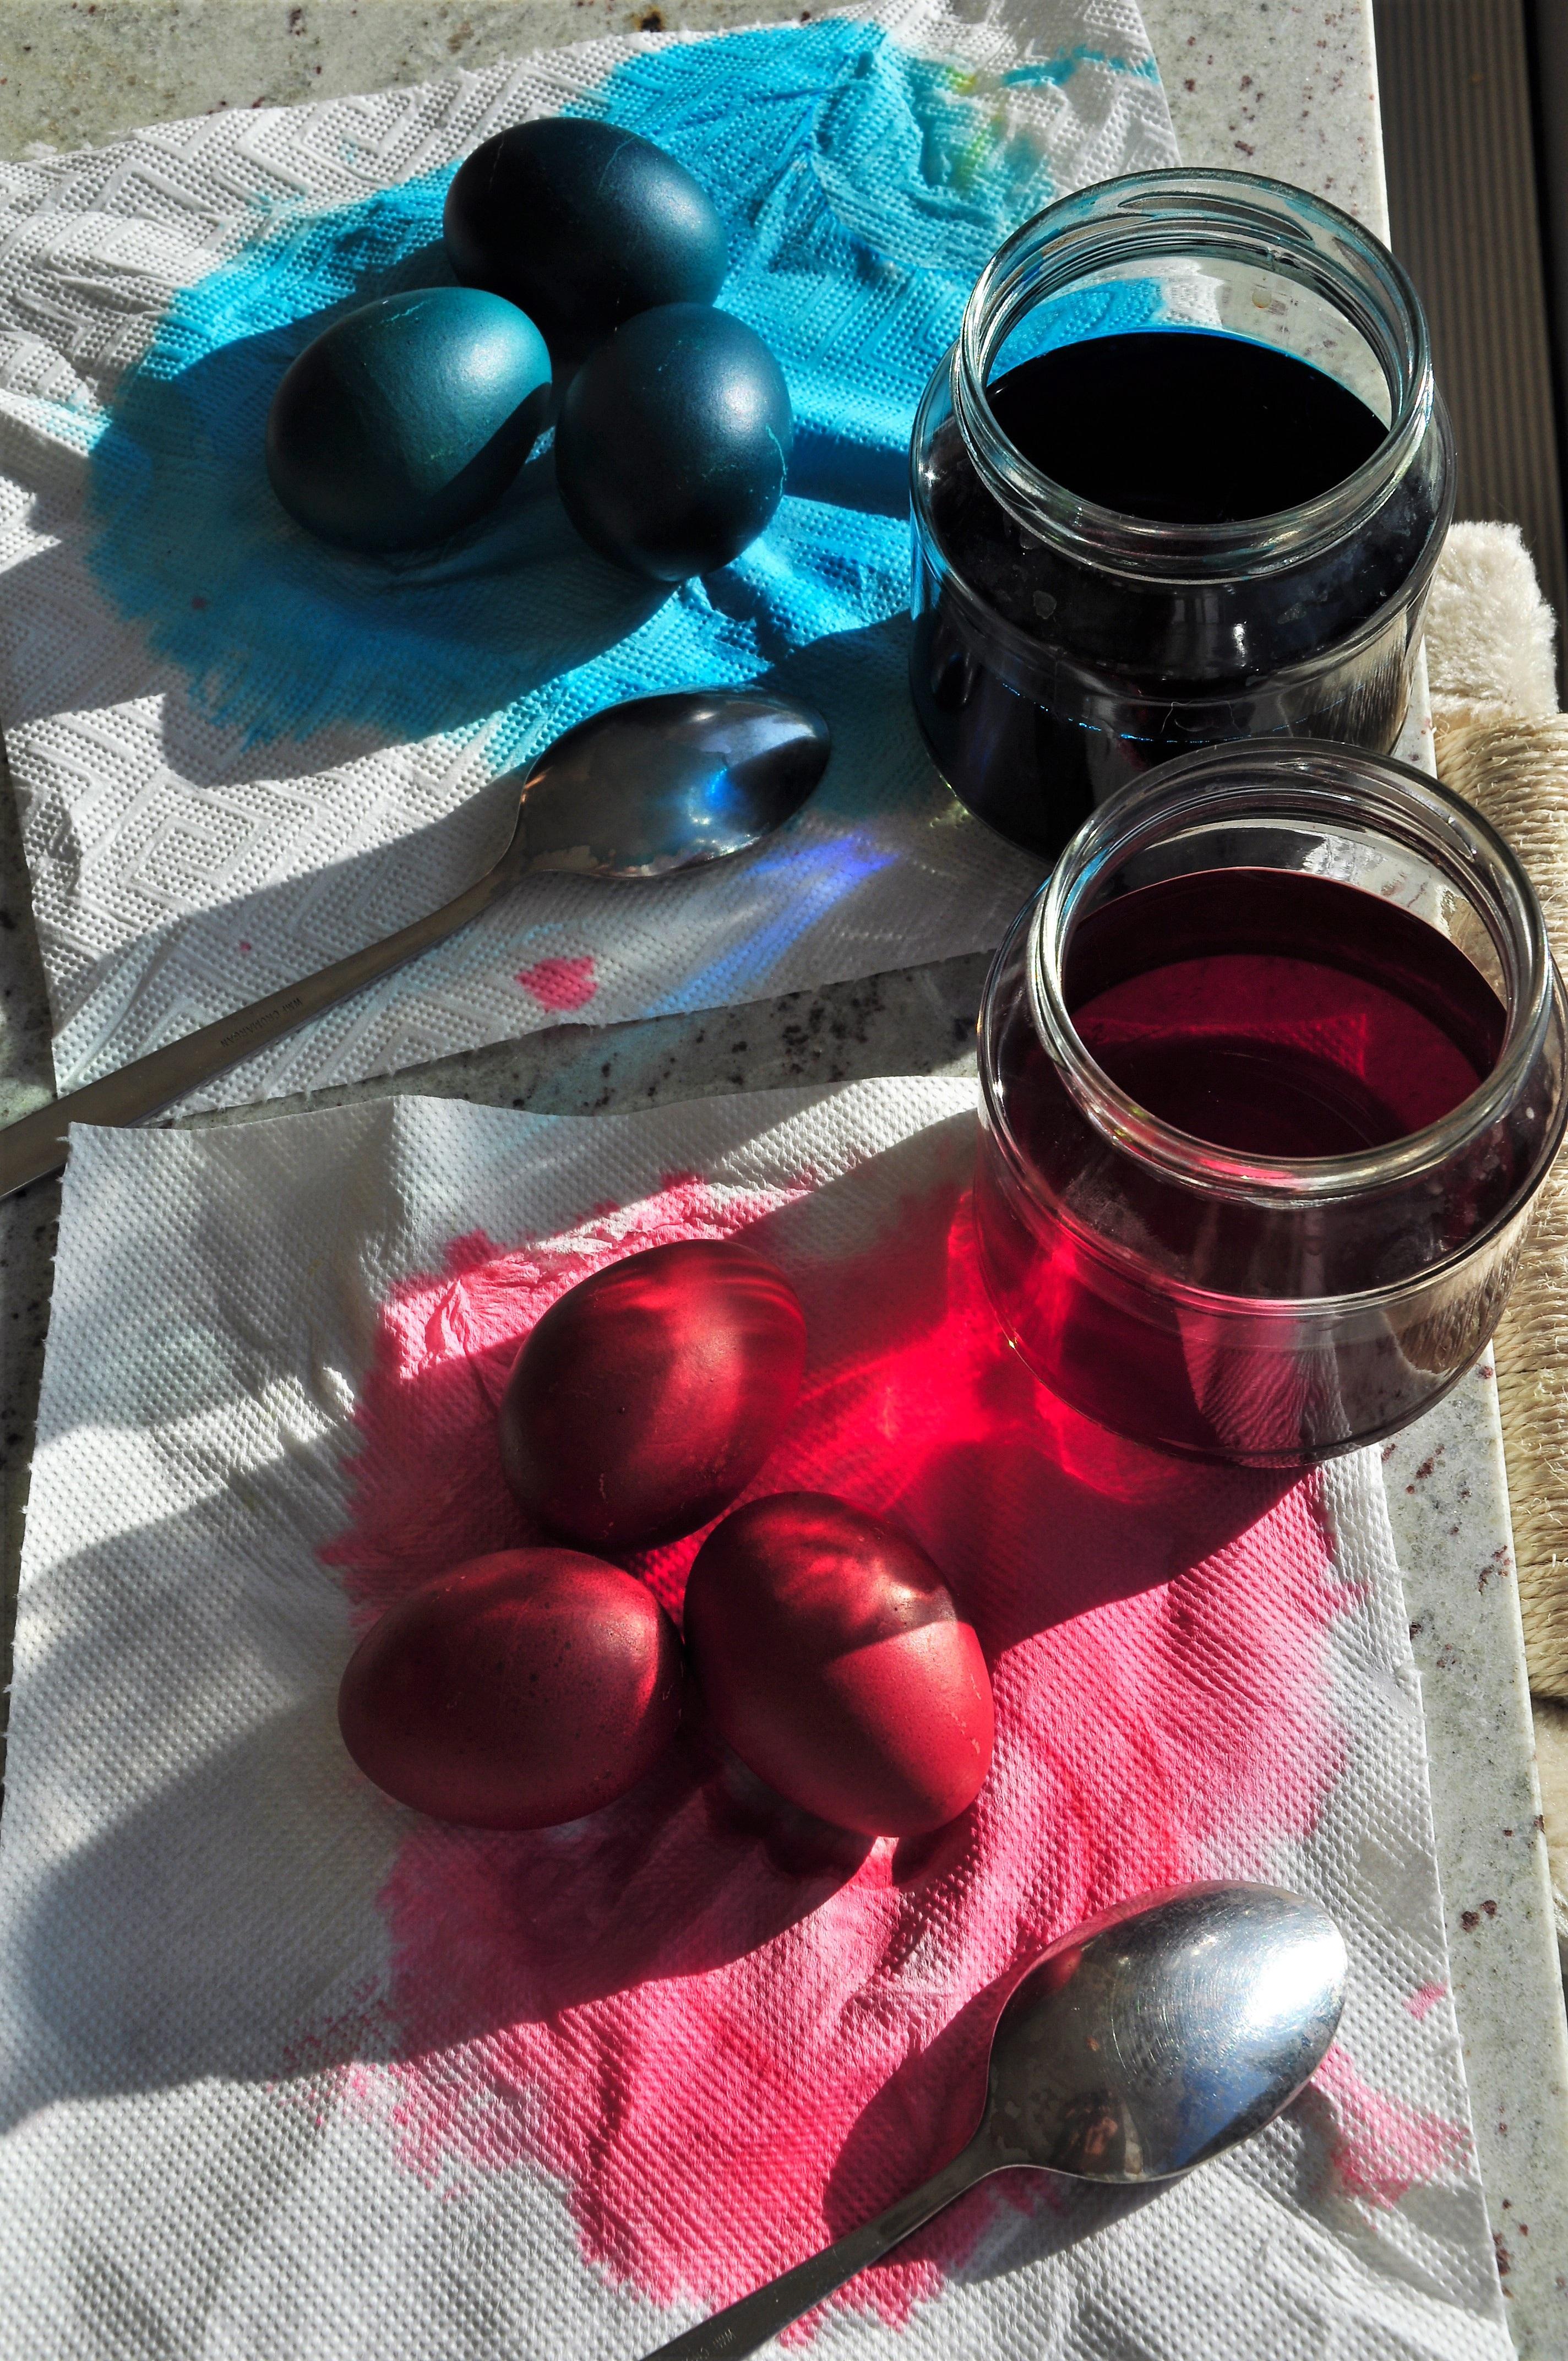 Fotograf Dekorasyon Bahar Kirmizi Renk Mavi Renkli Yumurta